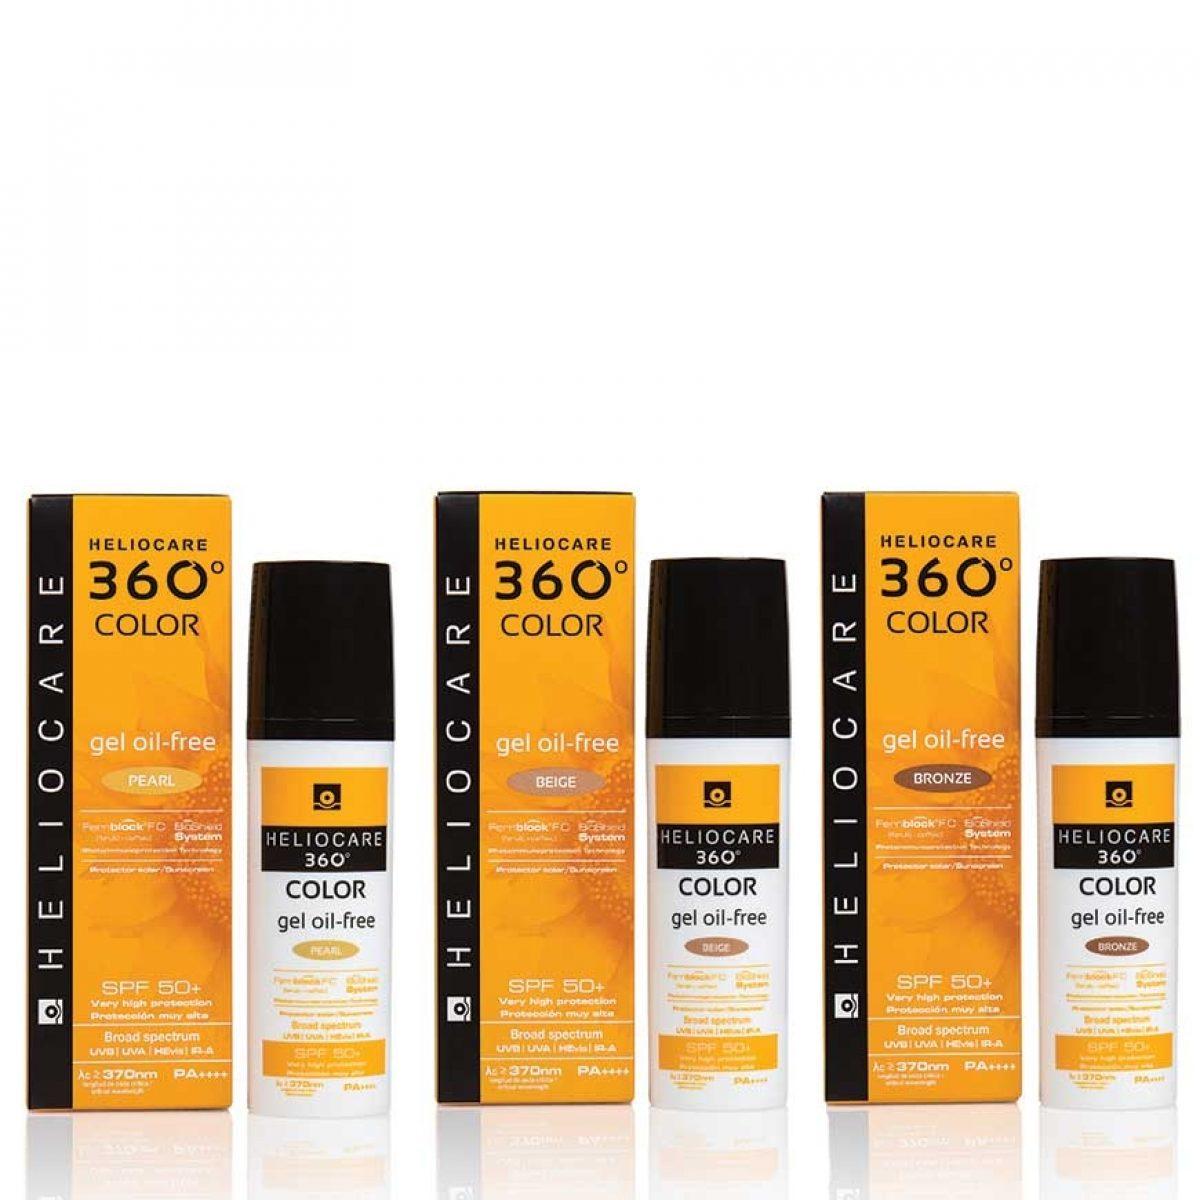 HELIOCARE 360 GEL OIL-FREE BRONZE SPF50+ 50ML